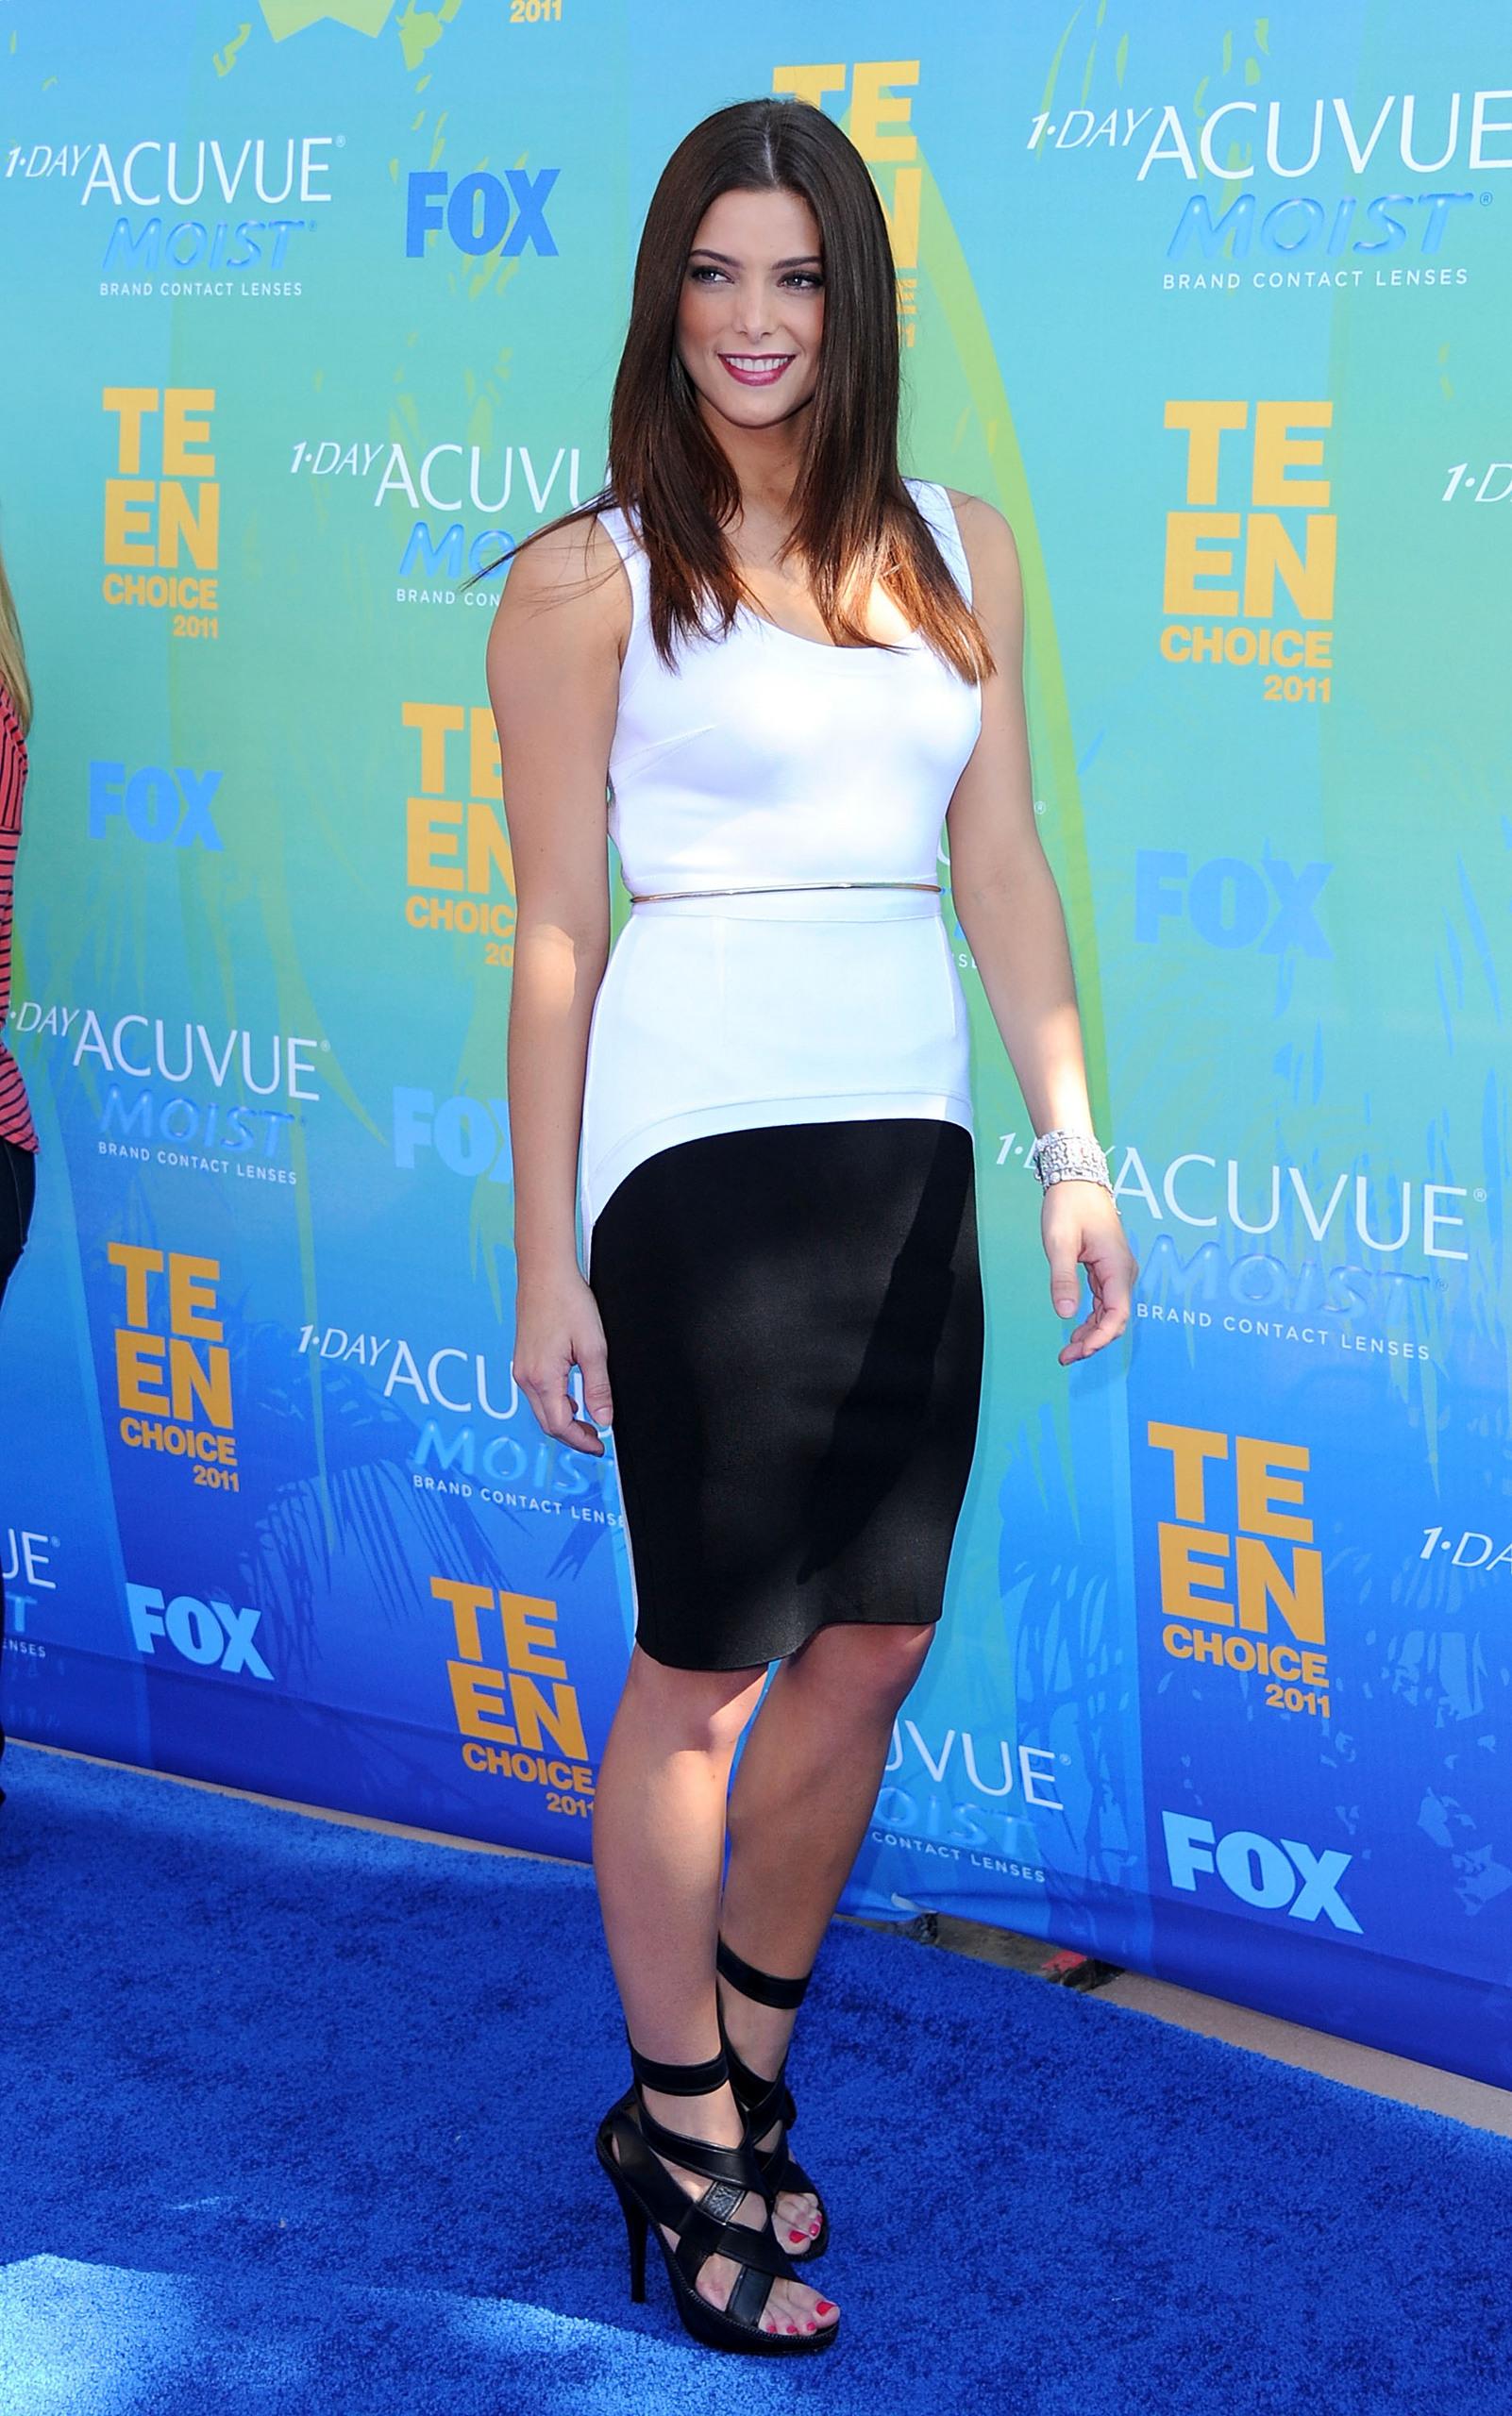 Ashley Greene at the Teen Choice Awards 2011 [HQ]